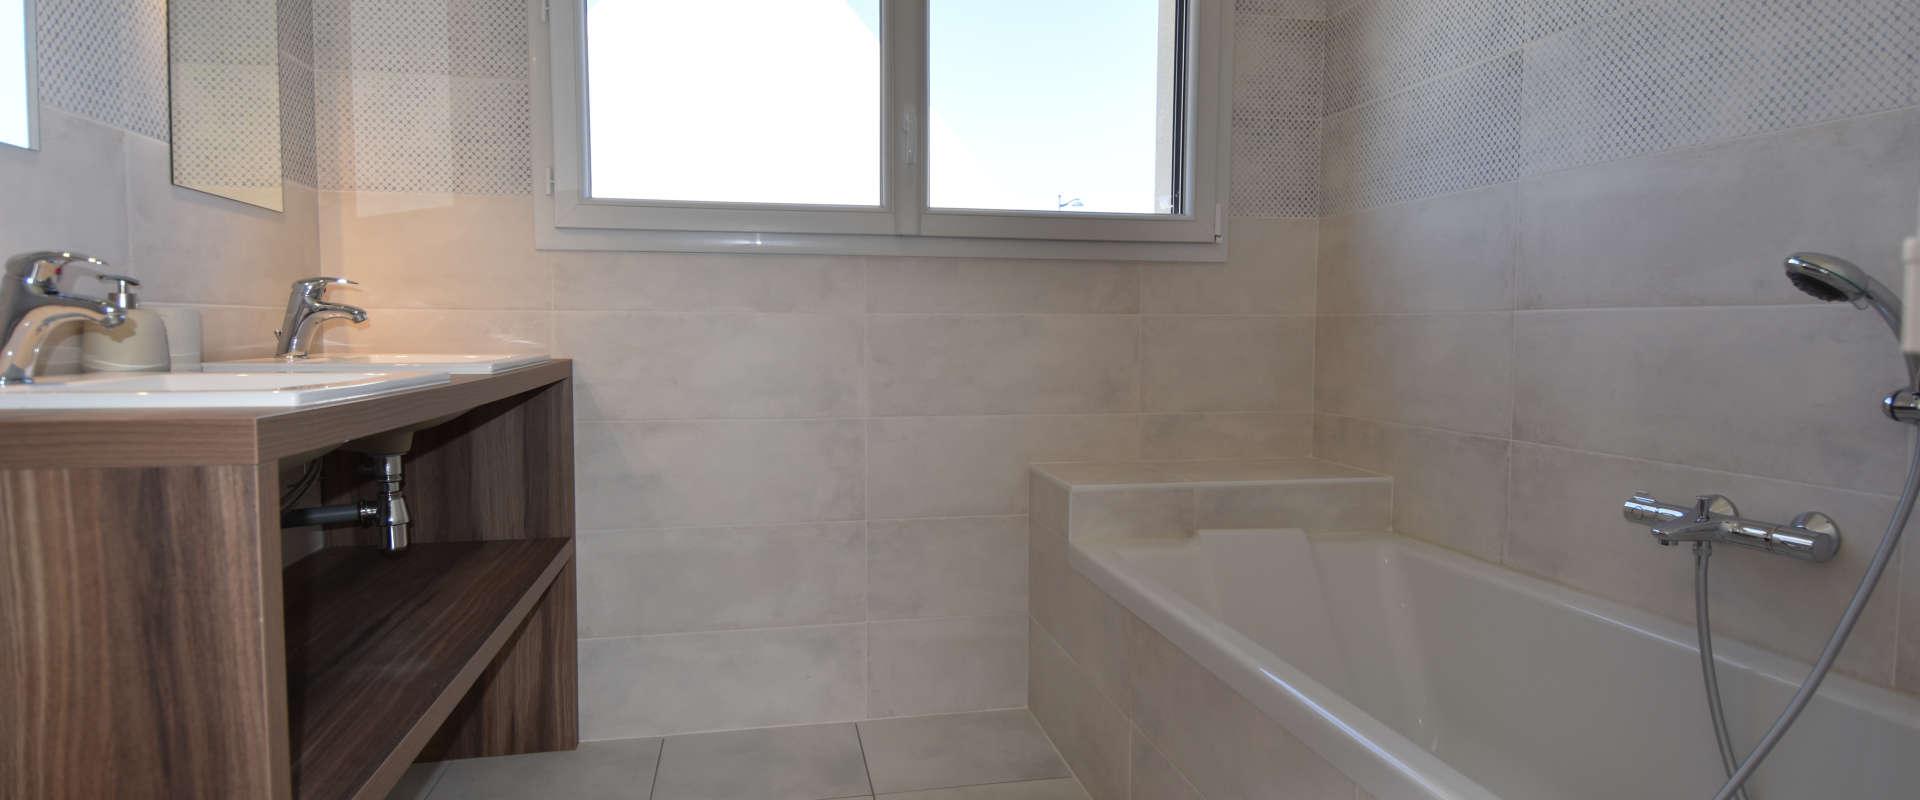 villa-des-marins-pecheurs-11-salle-de-bain-etage.jpg